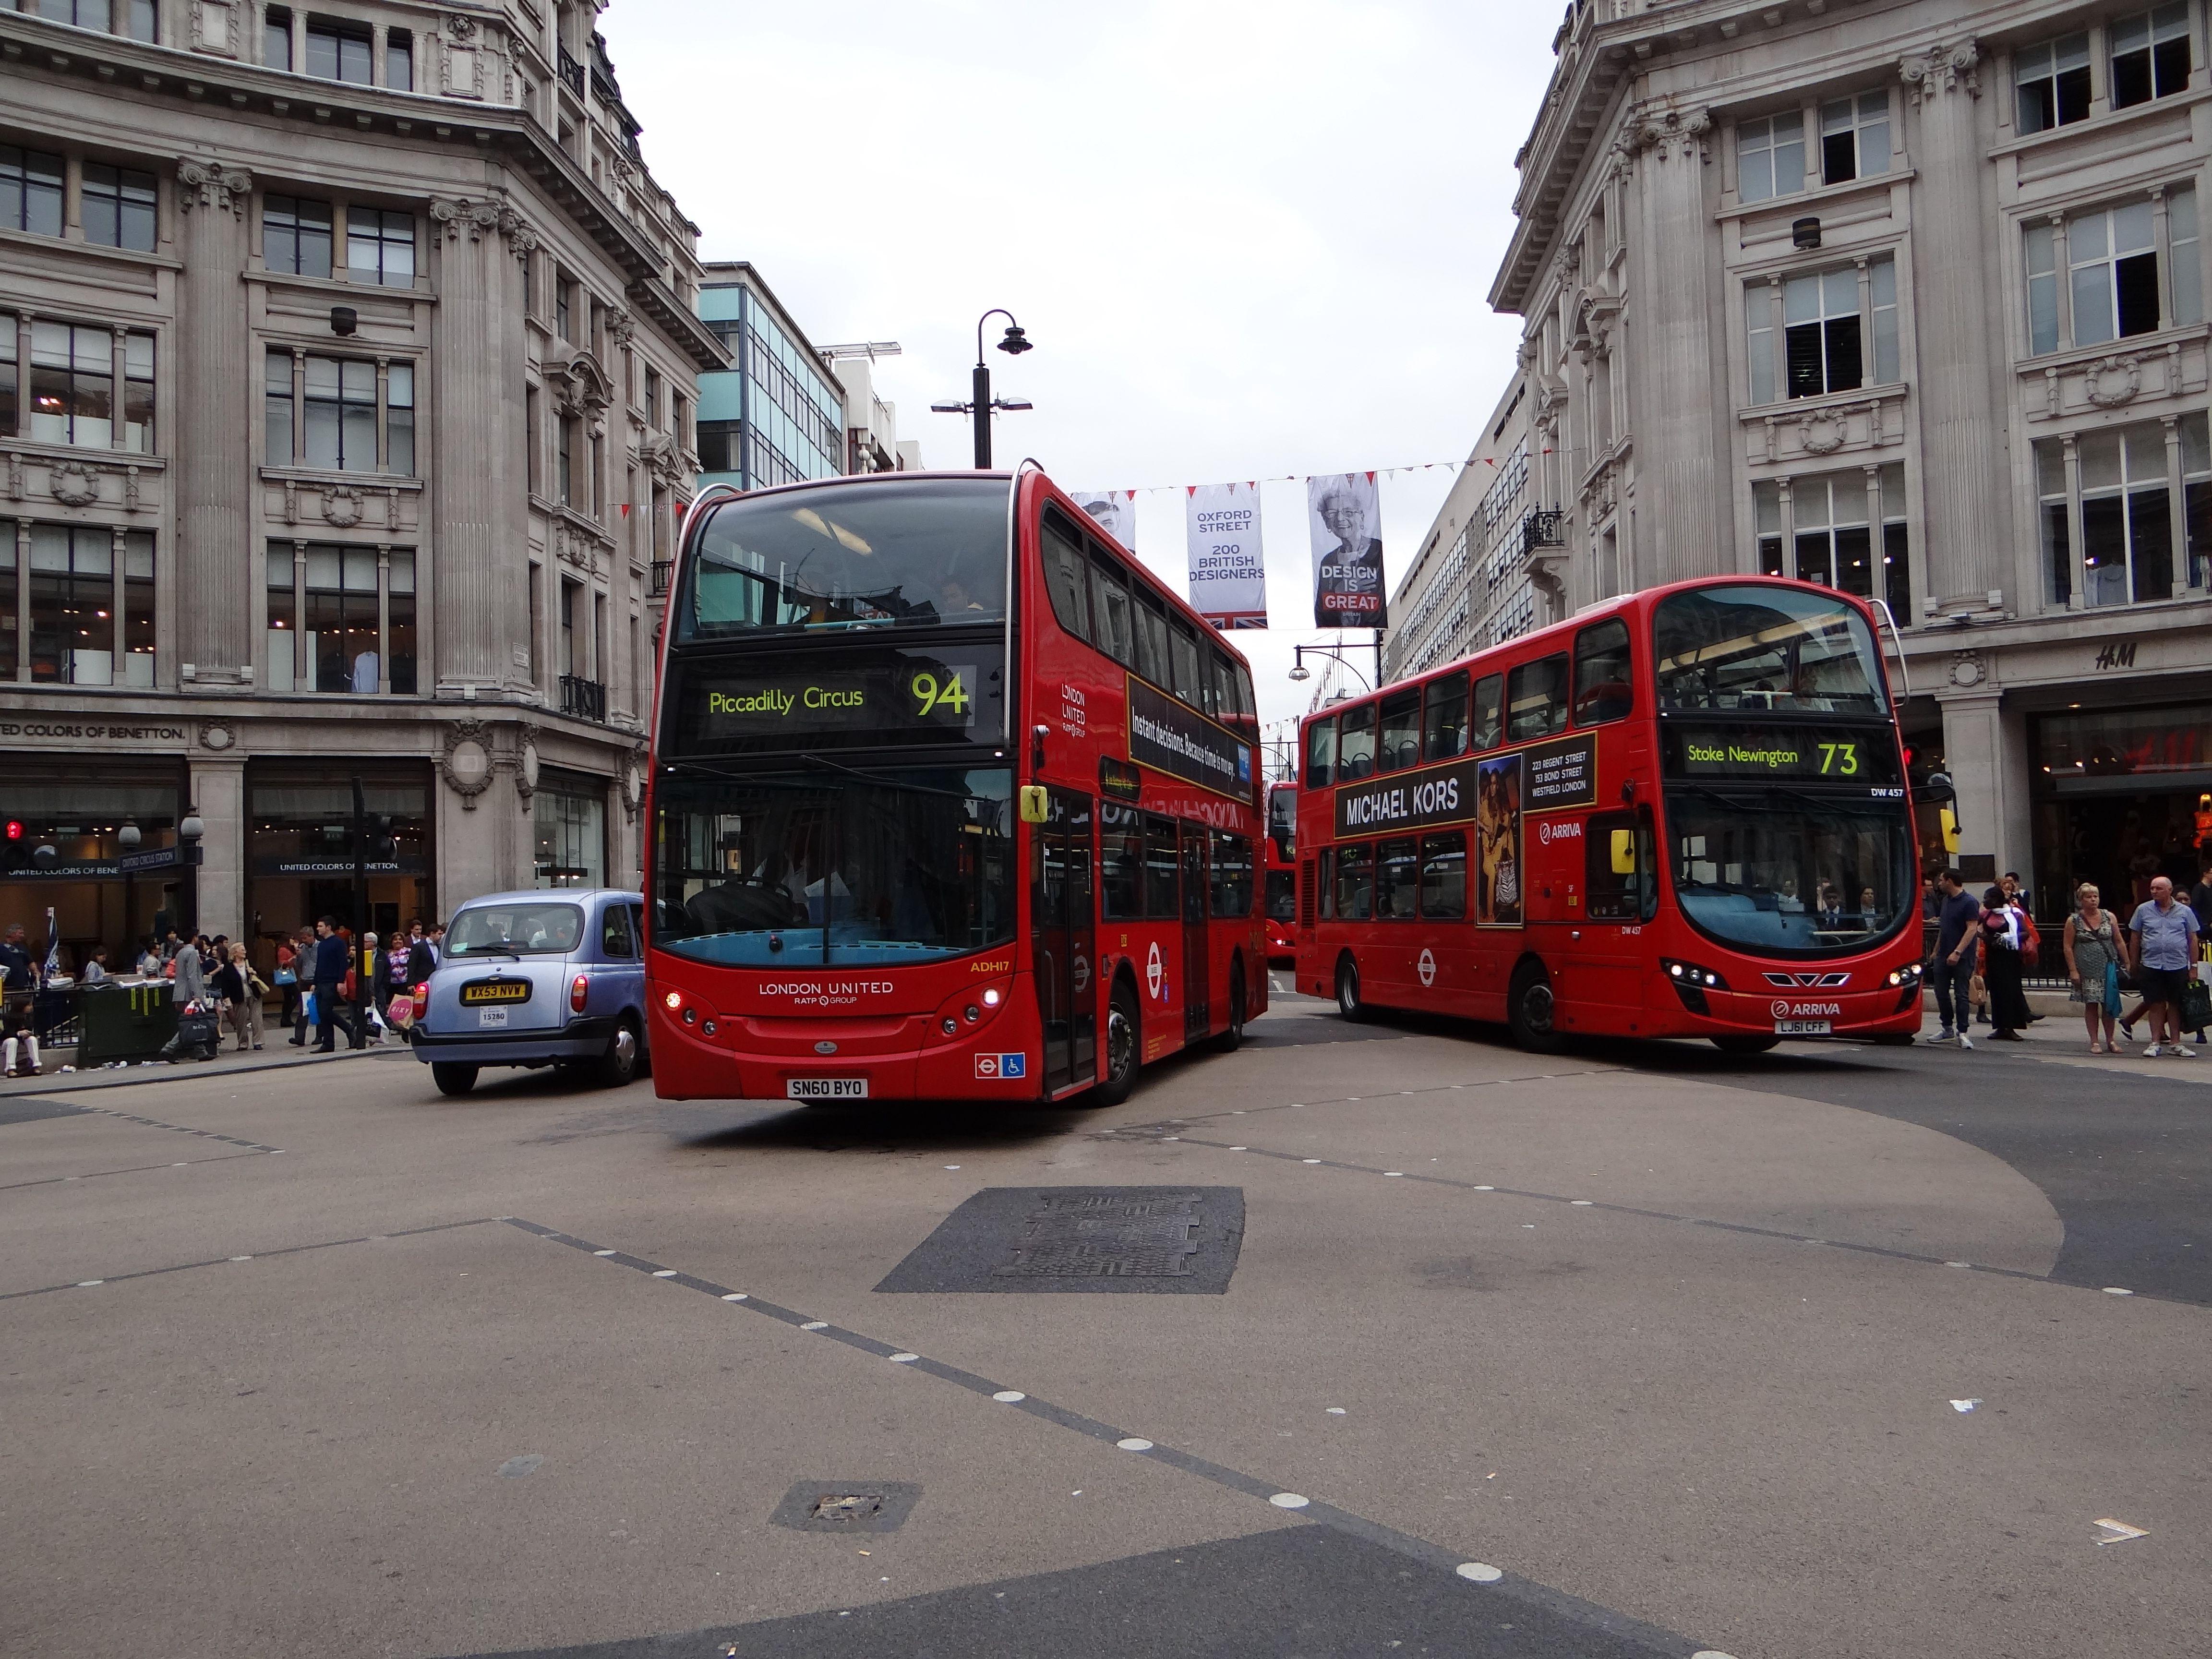 ADL E400H Nr. ADH 17 mit dem Kennzeichen SN60BYO als RATP London United-Linie 94 + VDL Bus DB300 Nr. DW 457 mit dem Kennzeichen LJ61CFF als Arriva London-Linie 73 am 01.06.2012 auf dem Oxford Circus.